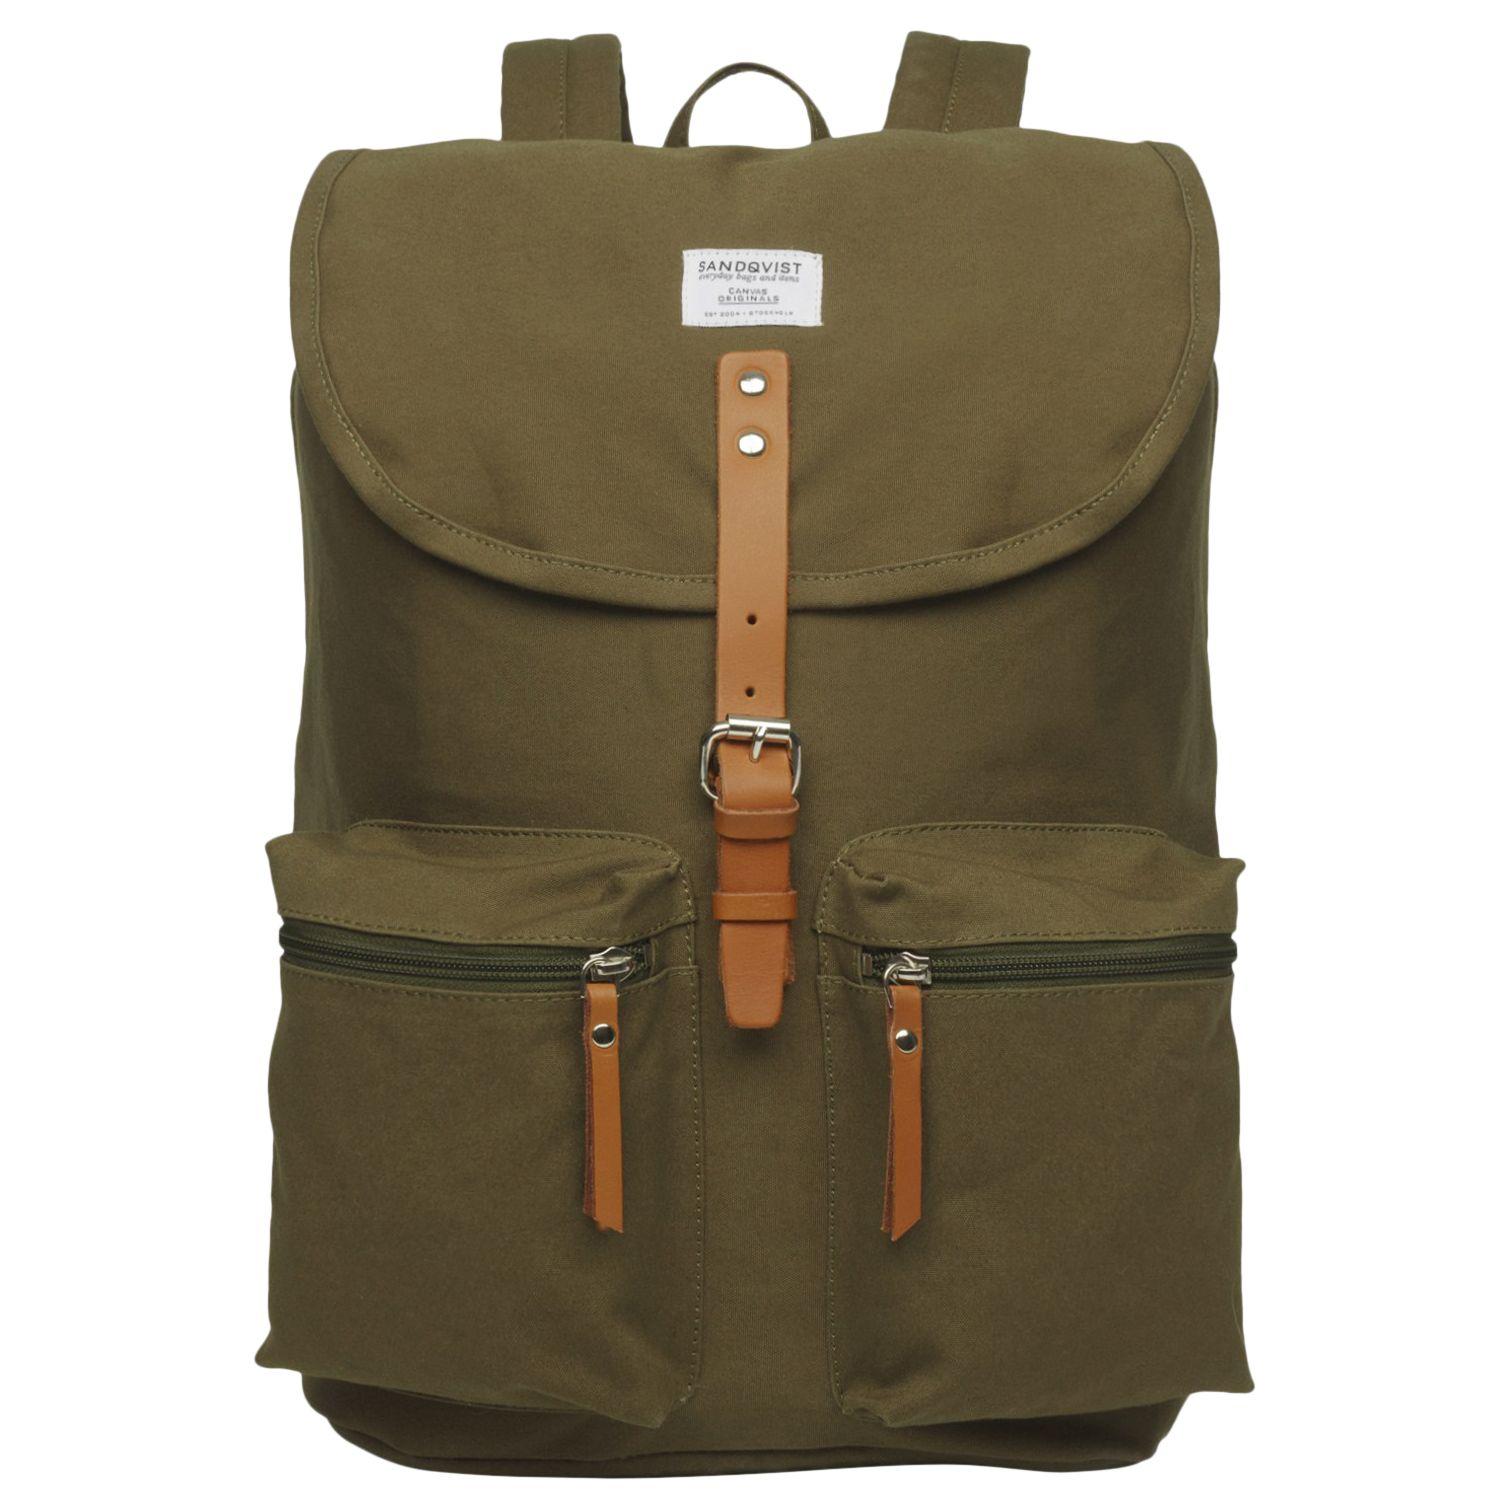 Sandqvist Sandqvist Roald Ground Organic Cotton Backpack